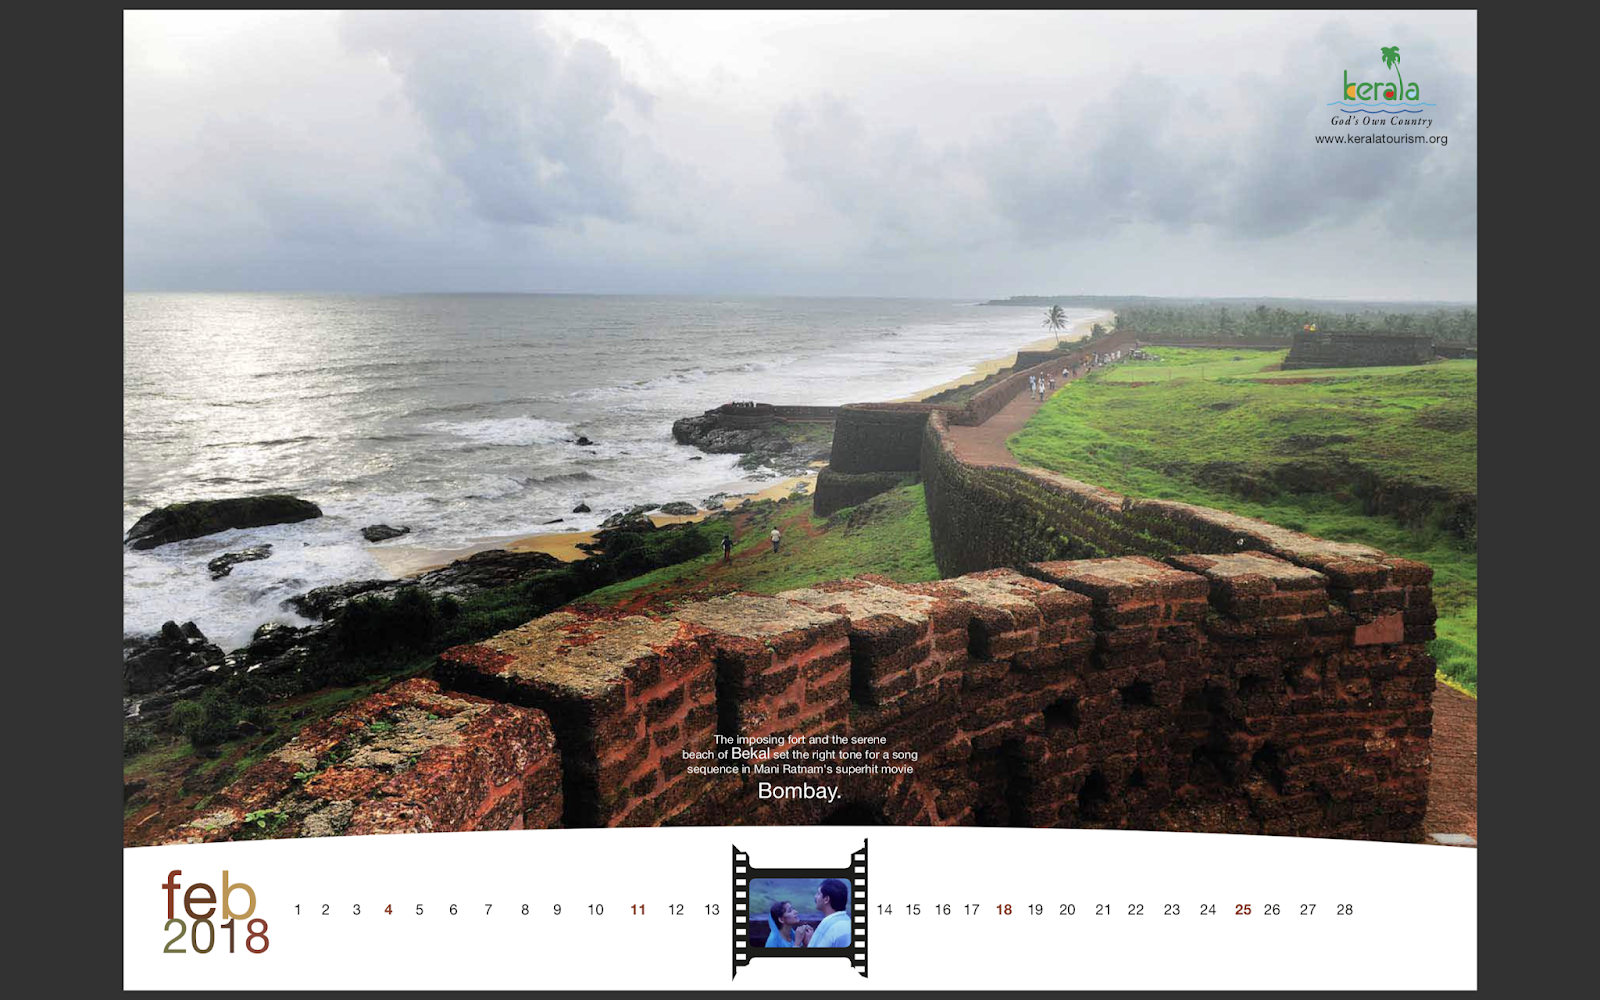 Kerala Tourism 2018 Calendar mock-up 3 | Stark Communications Pvt Ltd